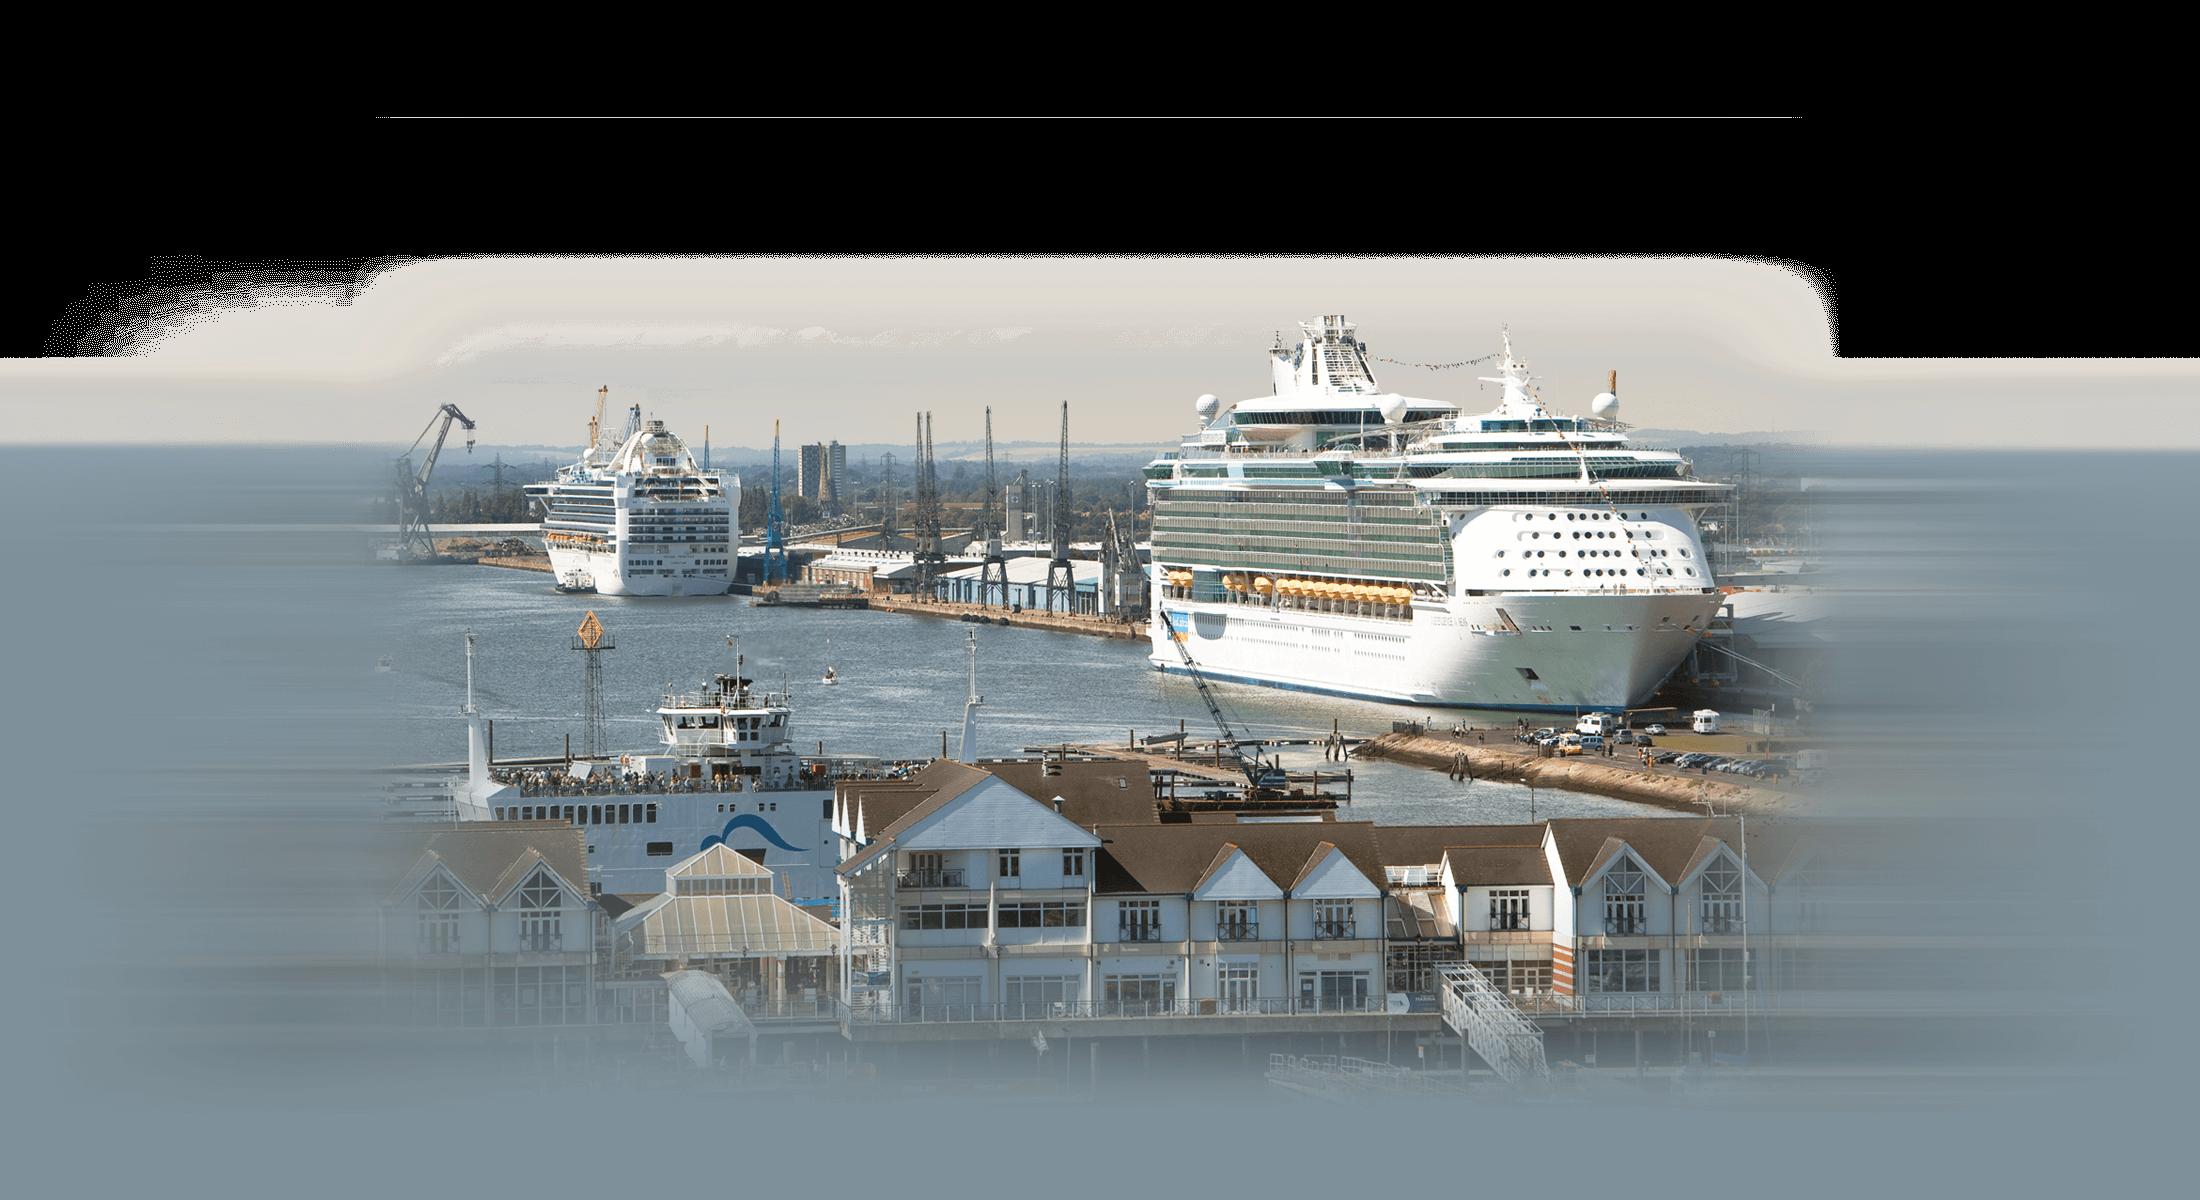 Southampton cruise liner